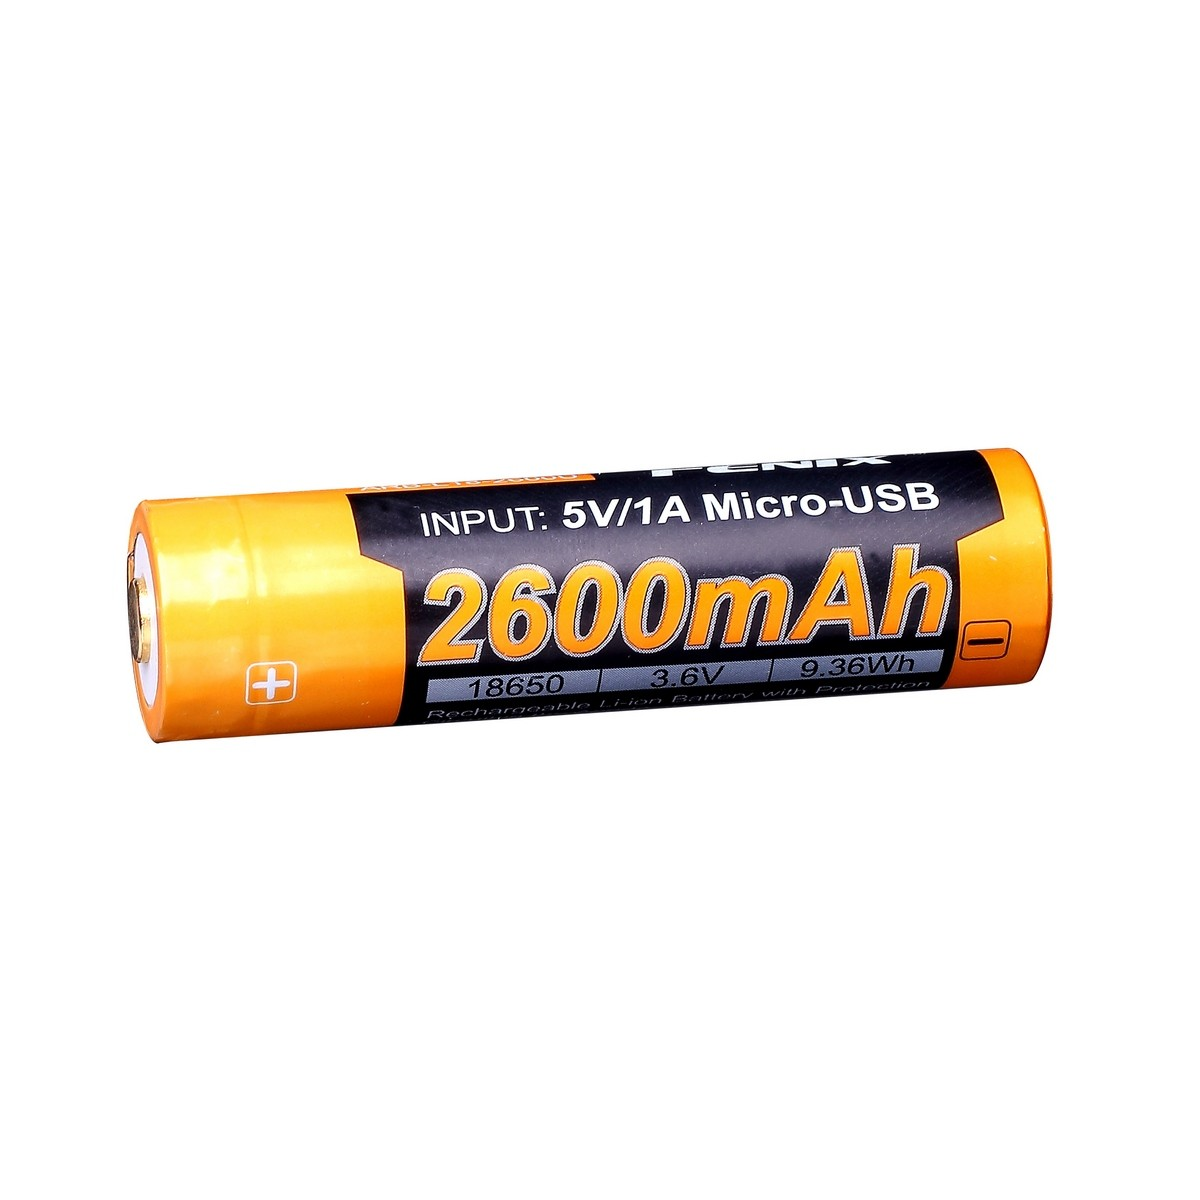 Аккумулятор 18650 Fenix 2600U mAh с разъемом для USB (+ Антисептик-спрей для рук в подарок!)